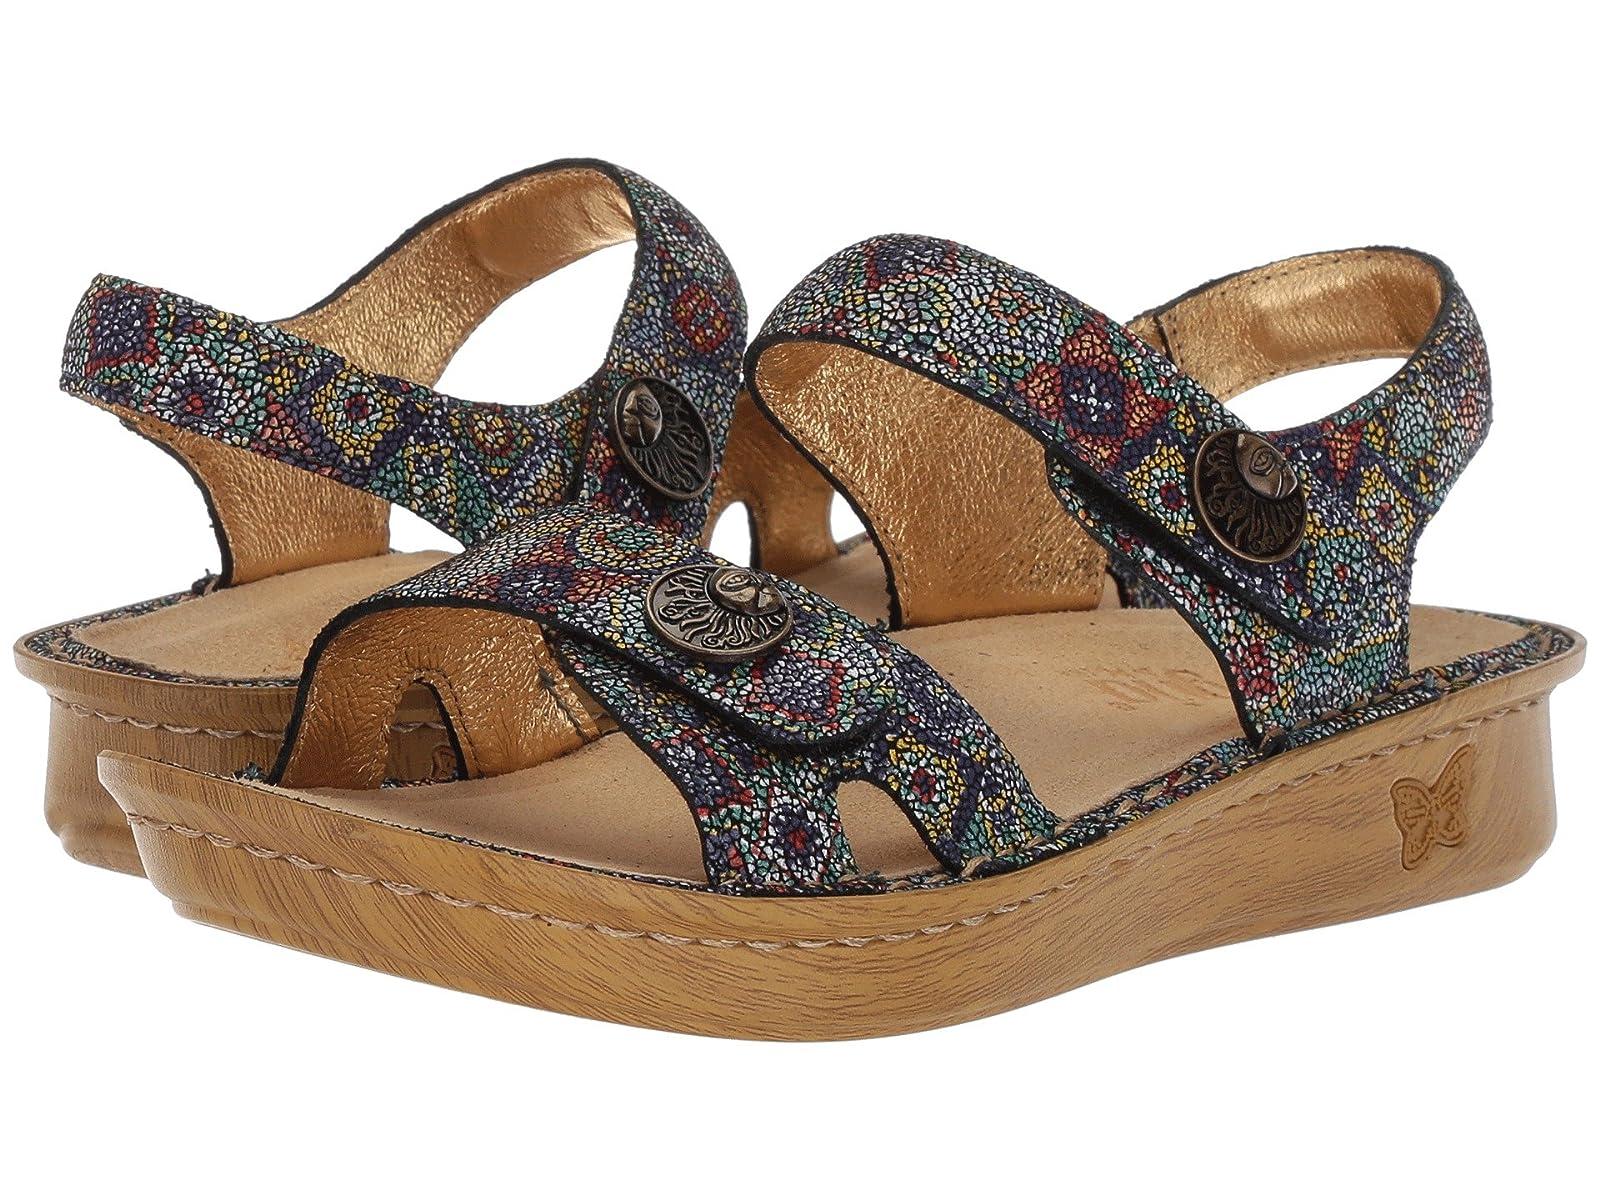 Alegria ViennaAtmospheric grades have affordable shoes